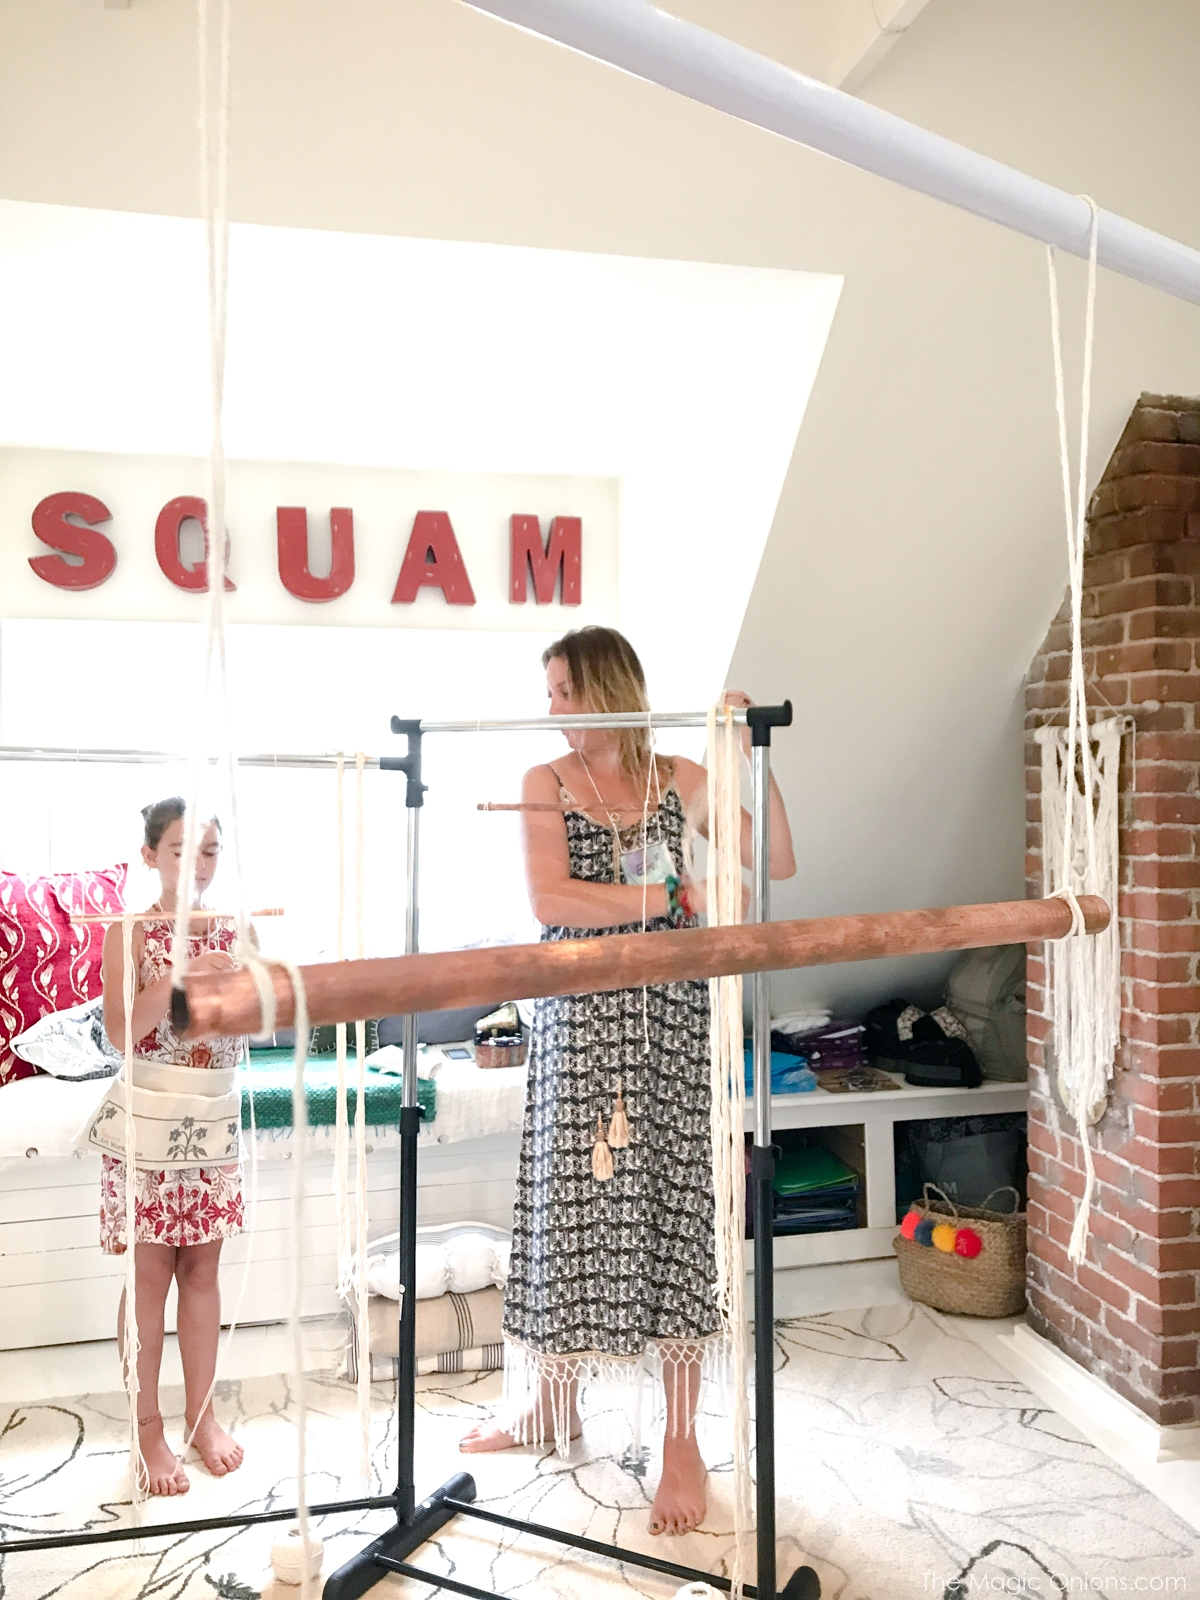 Macrame Workshop at Squam HQ